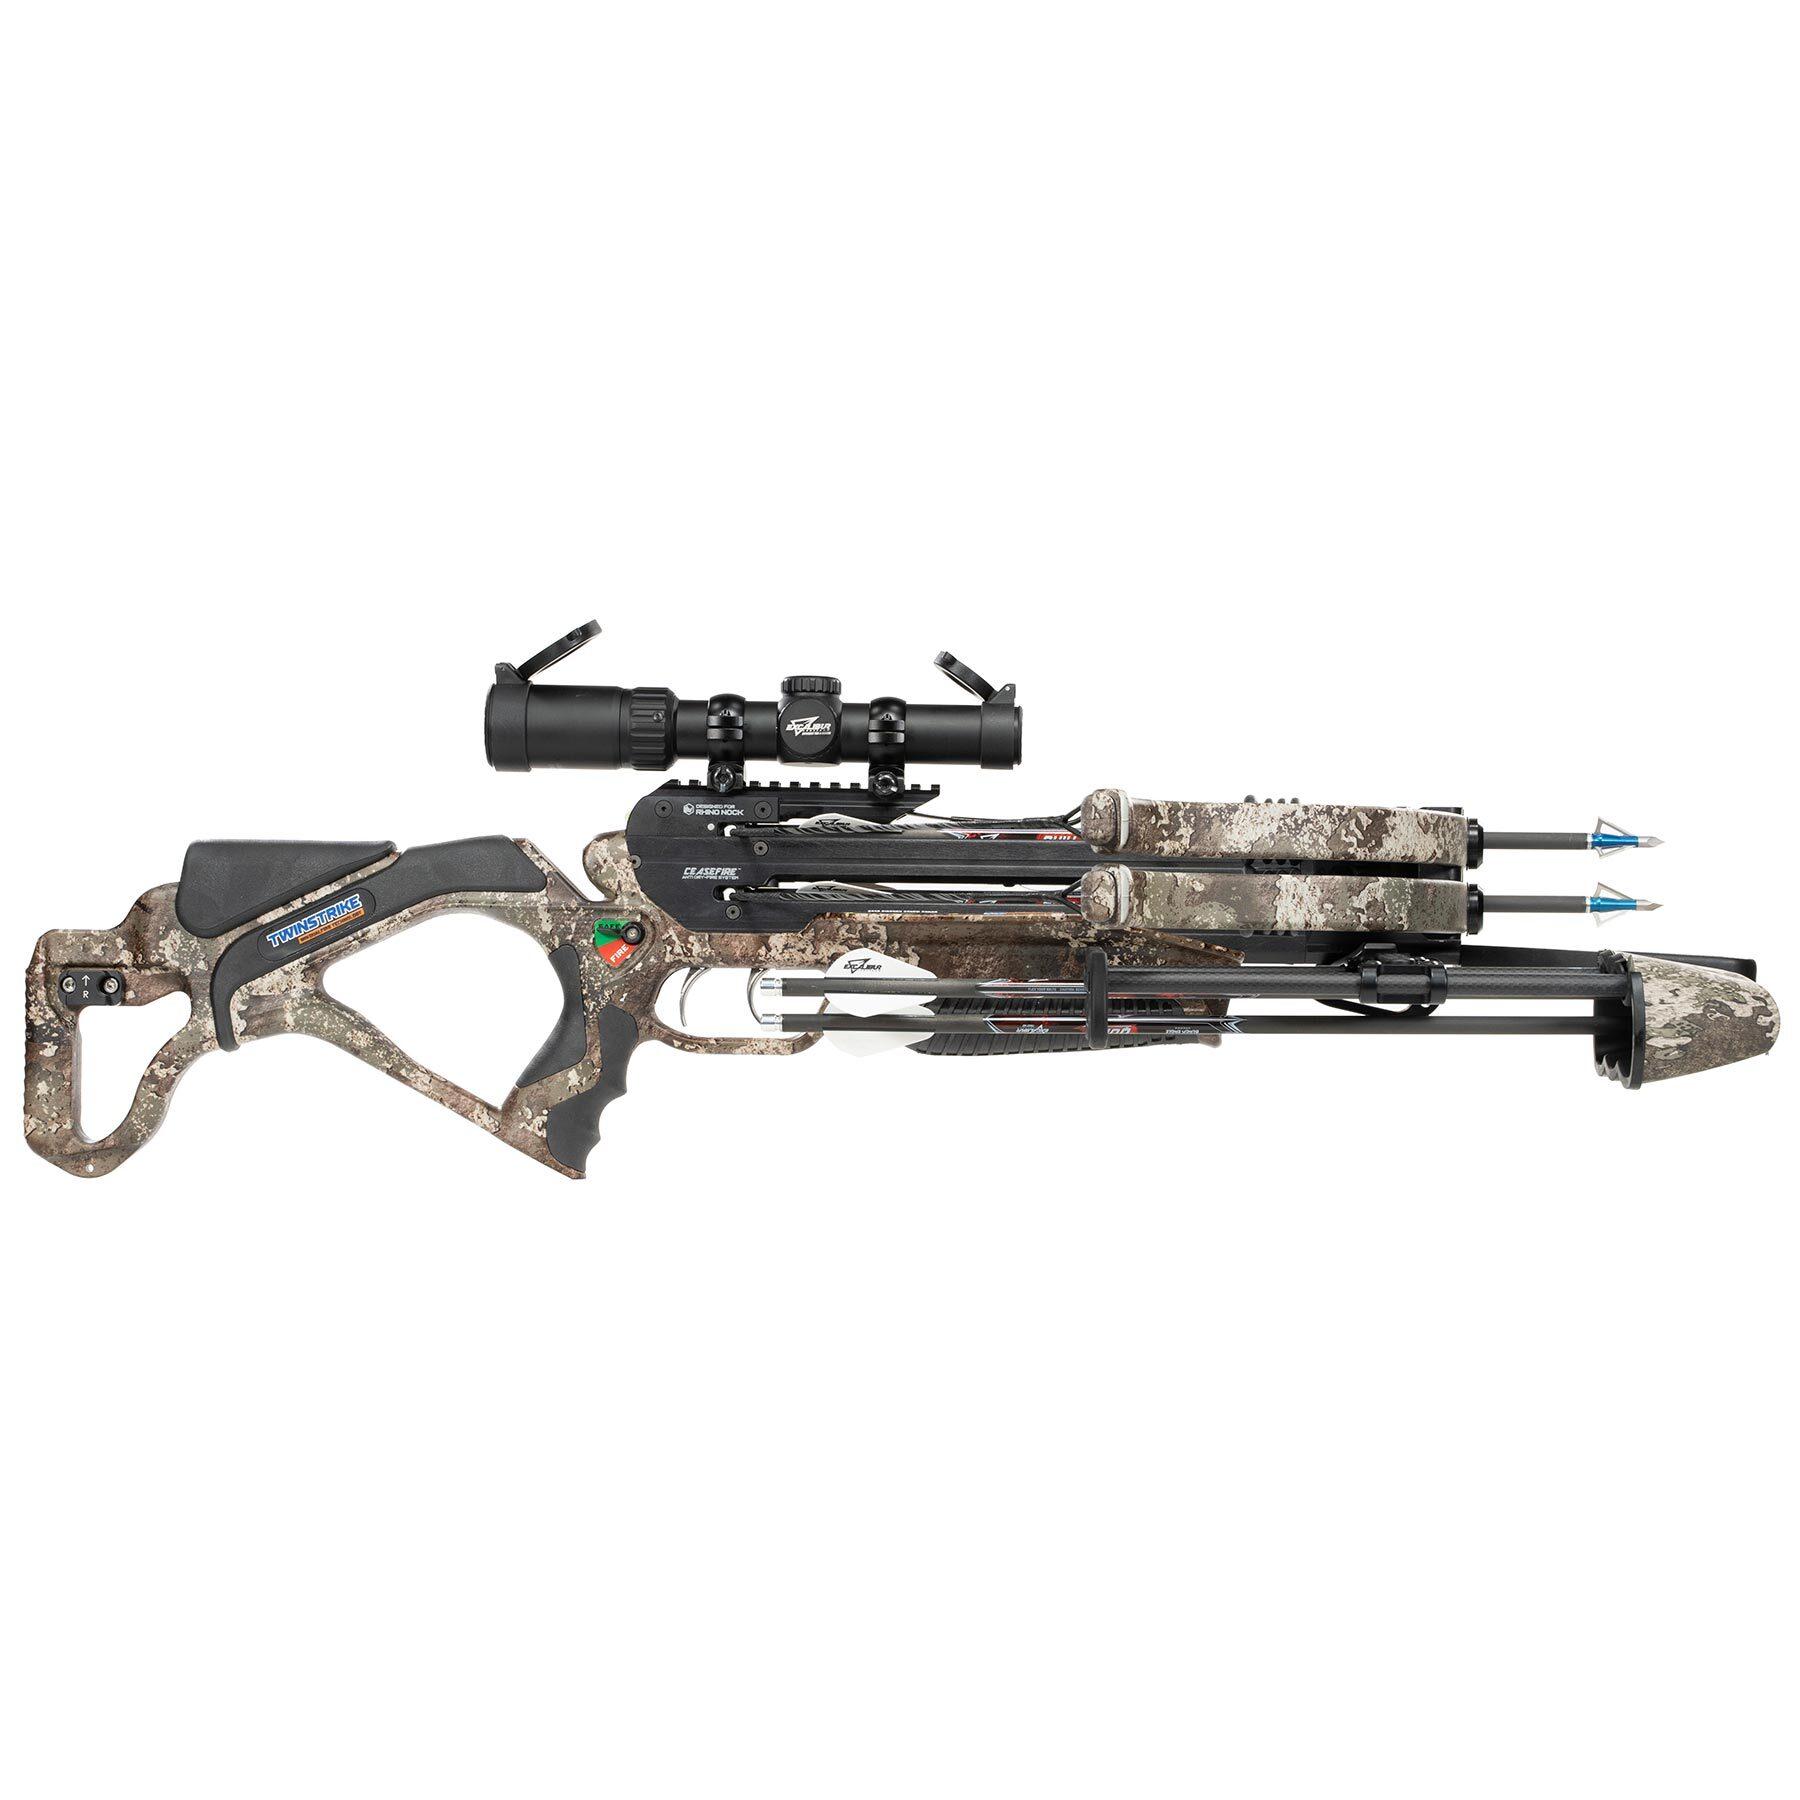 TwinStrike crossbow in Strata camo